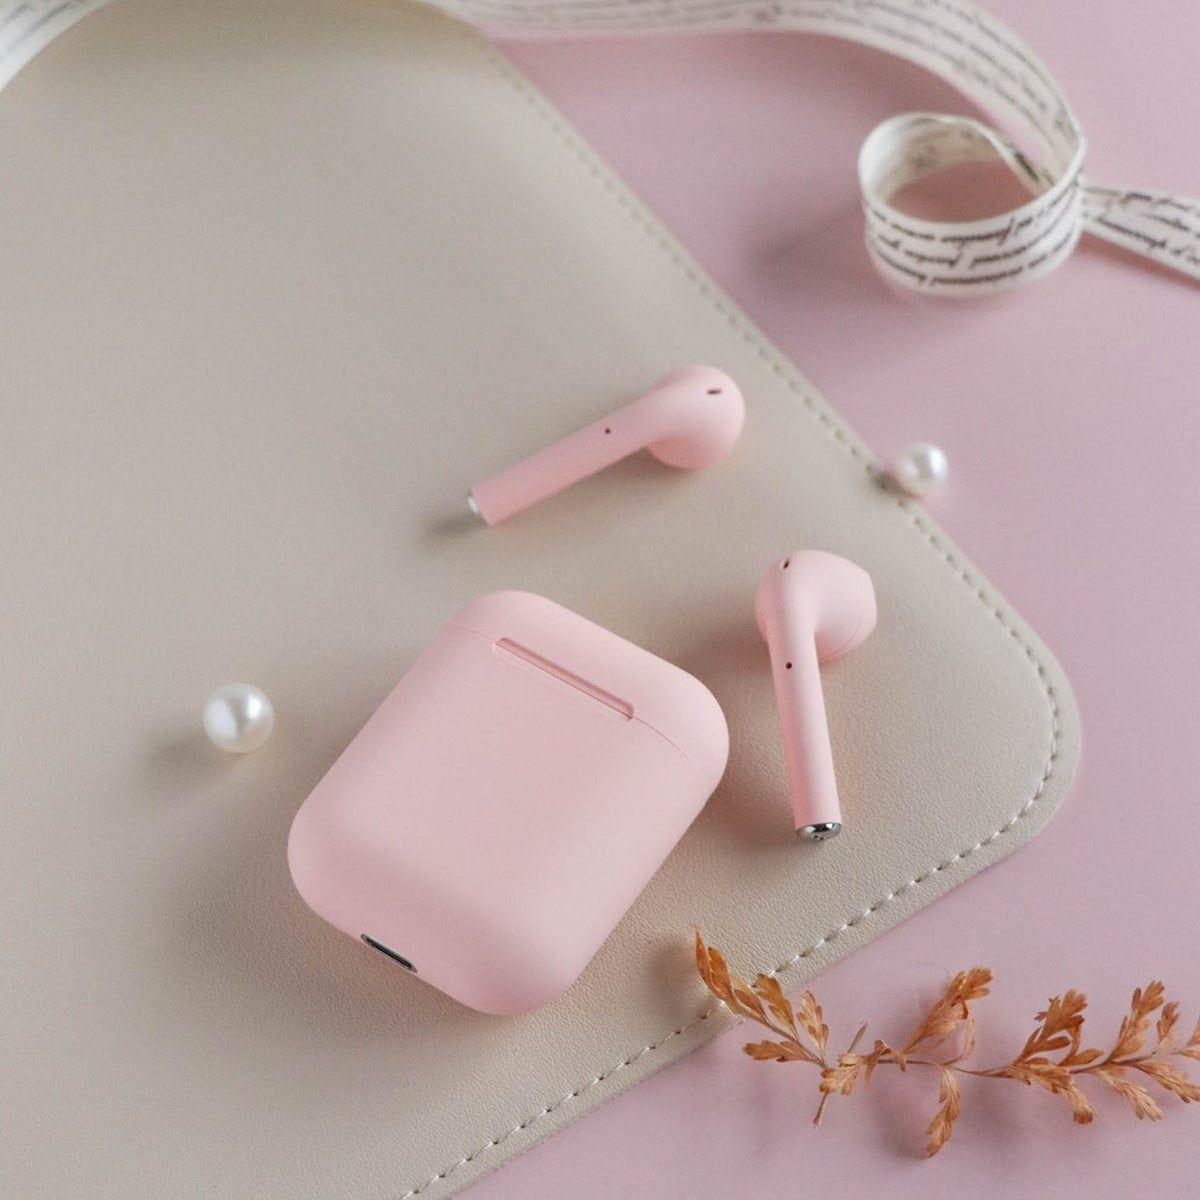 Airpods I12tws Pink Pink Headphones Makeup Kit For Kids Pink Apple